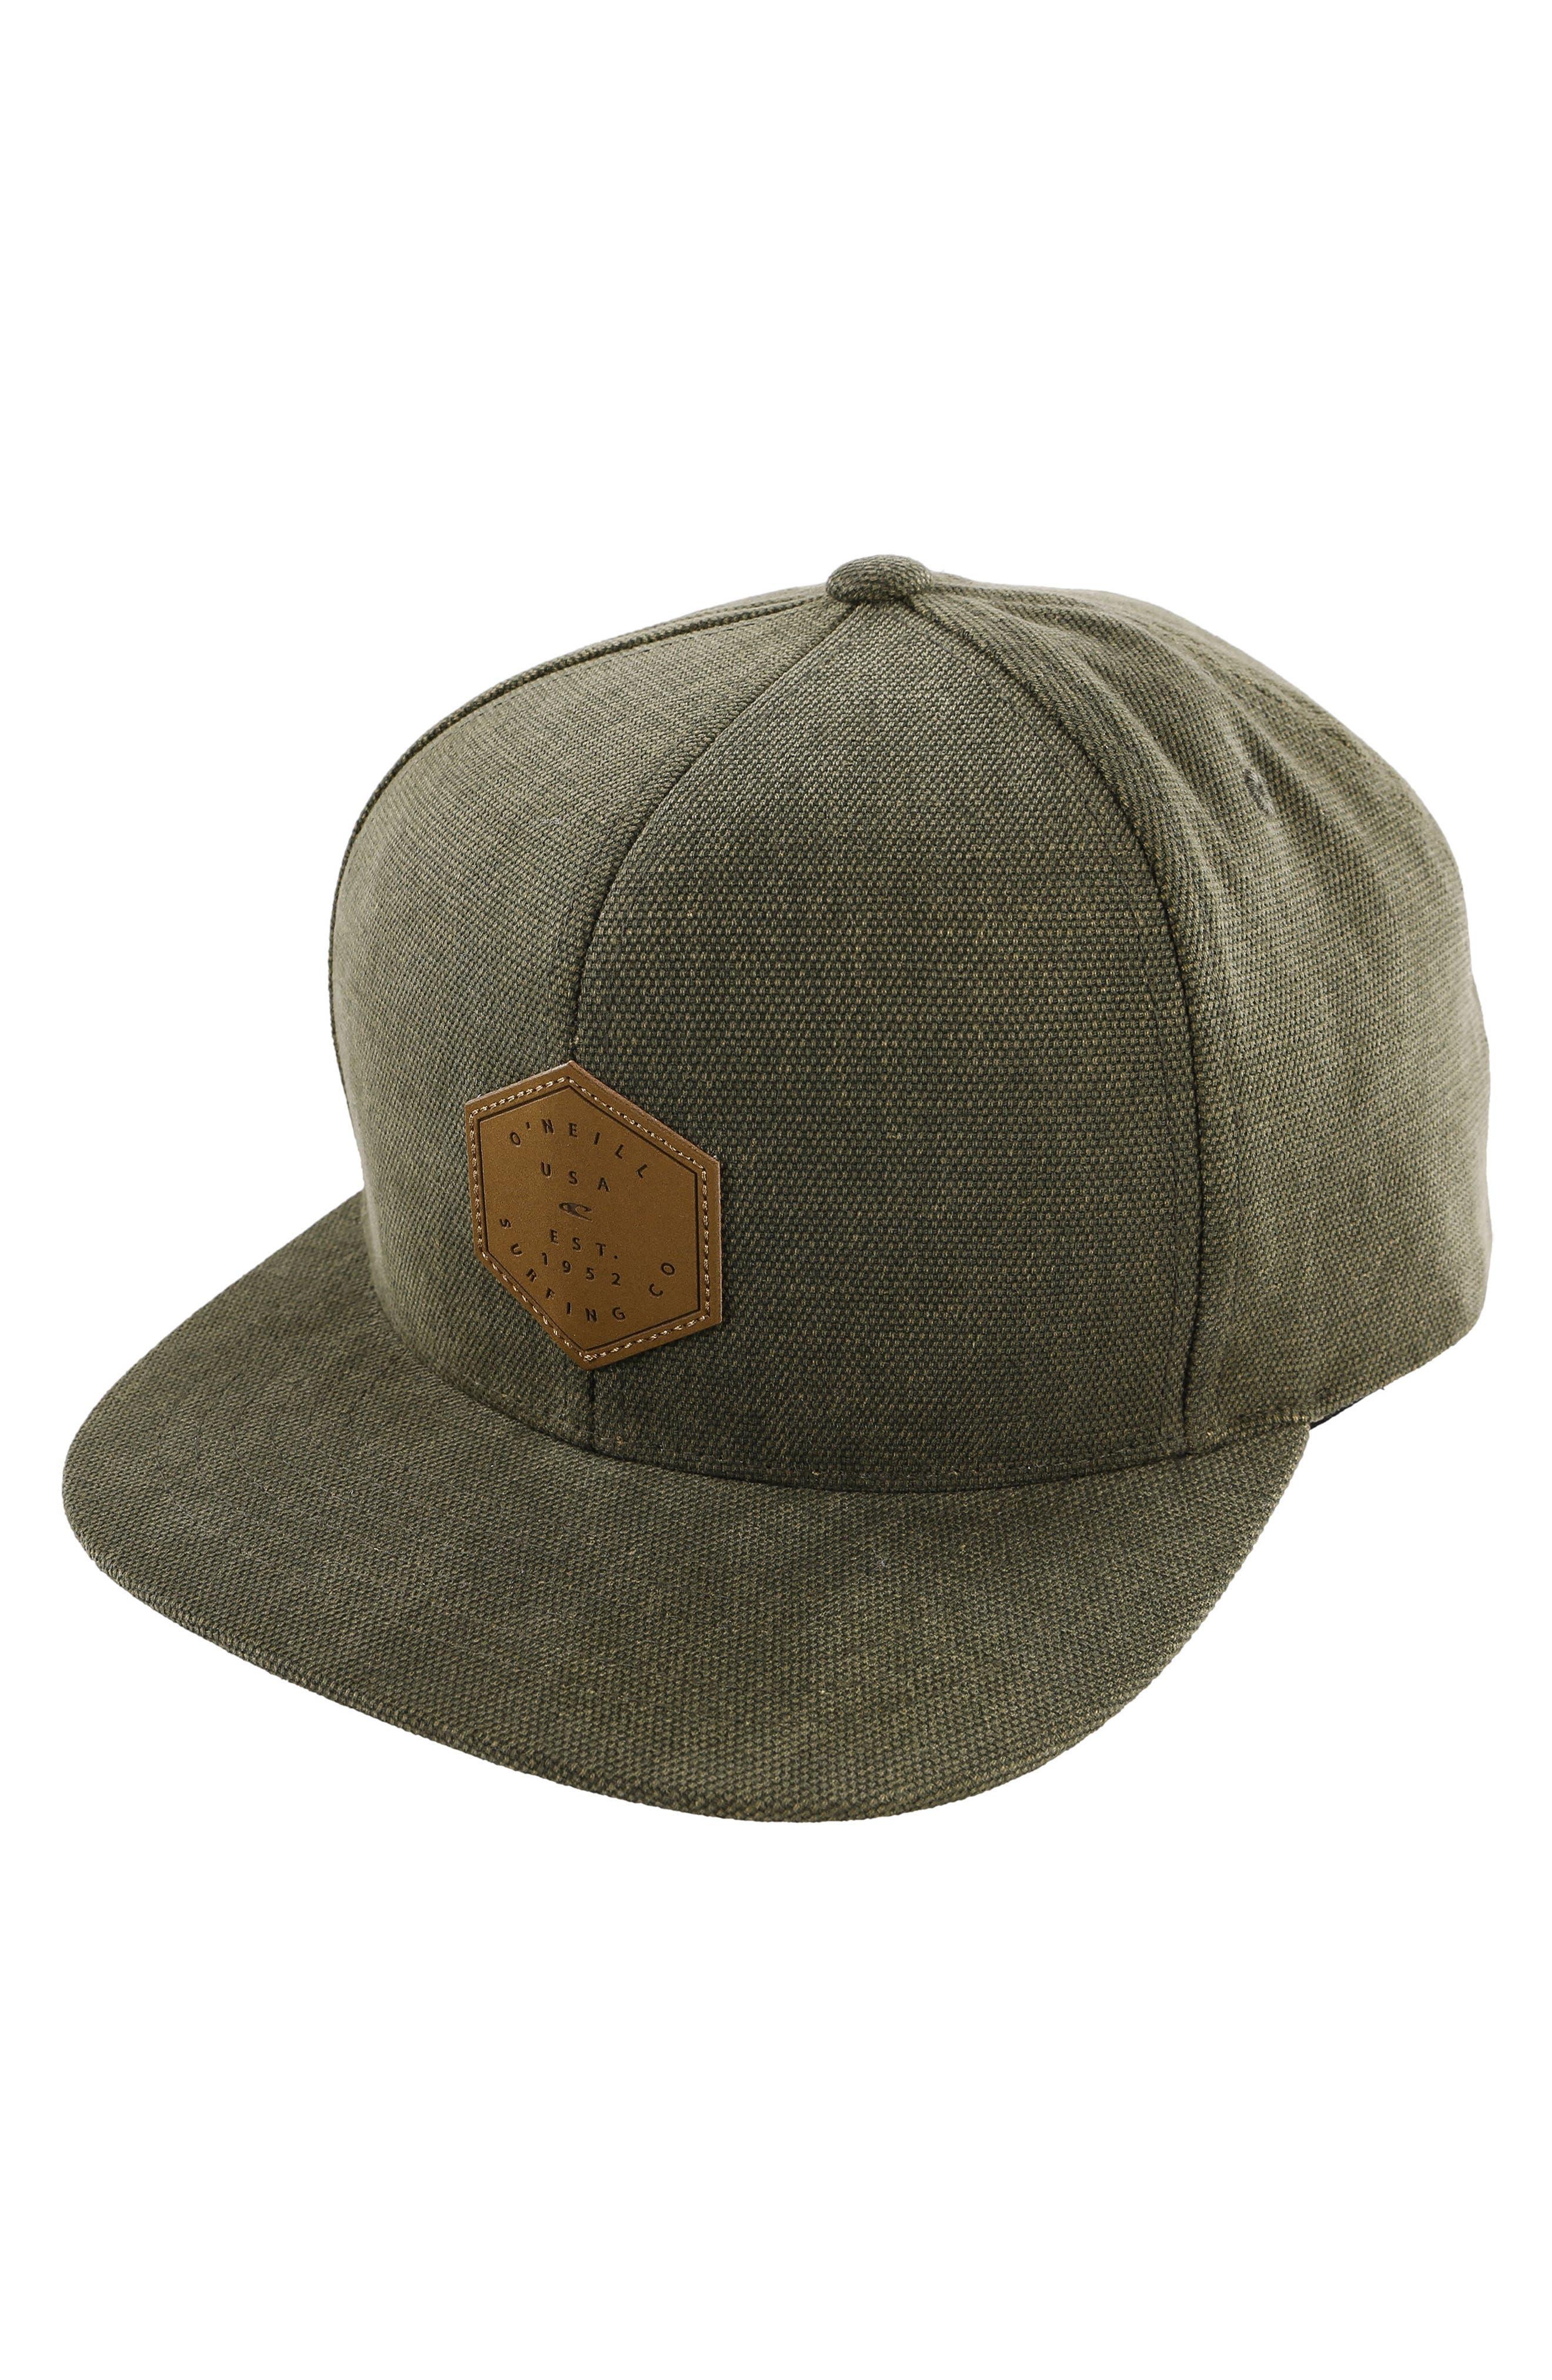 Lowtide Snapback Baseball Cap,                         Main,                         color, Army